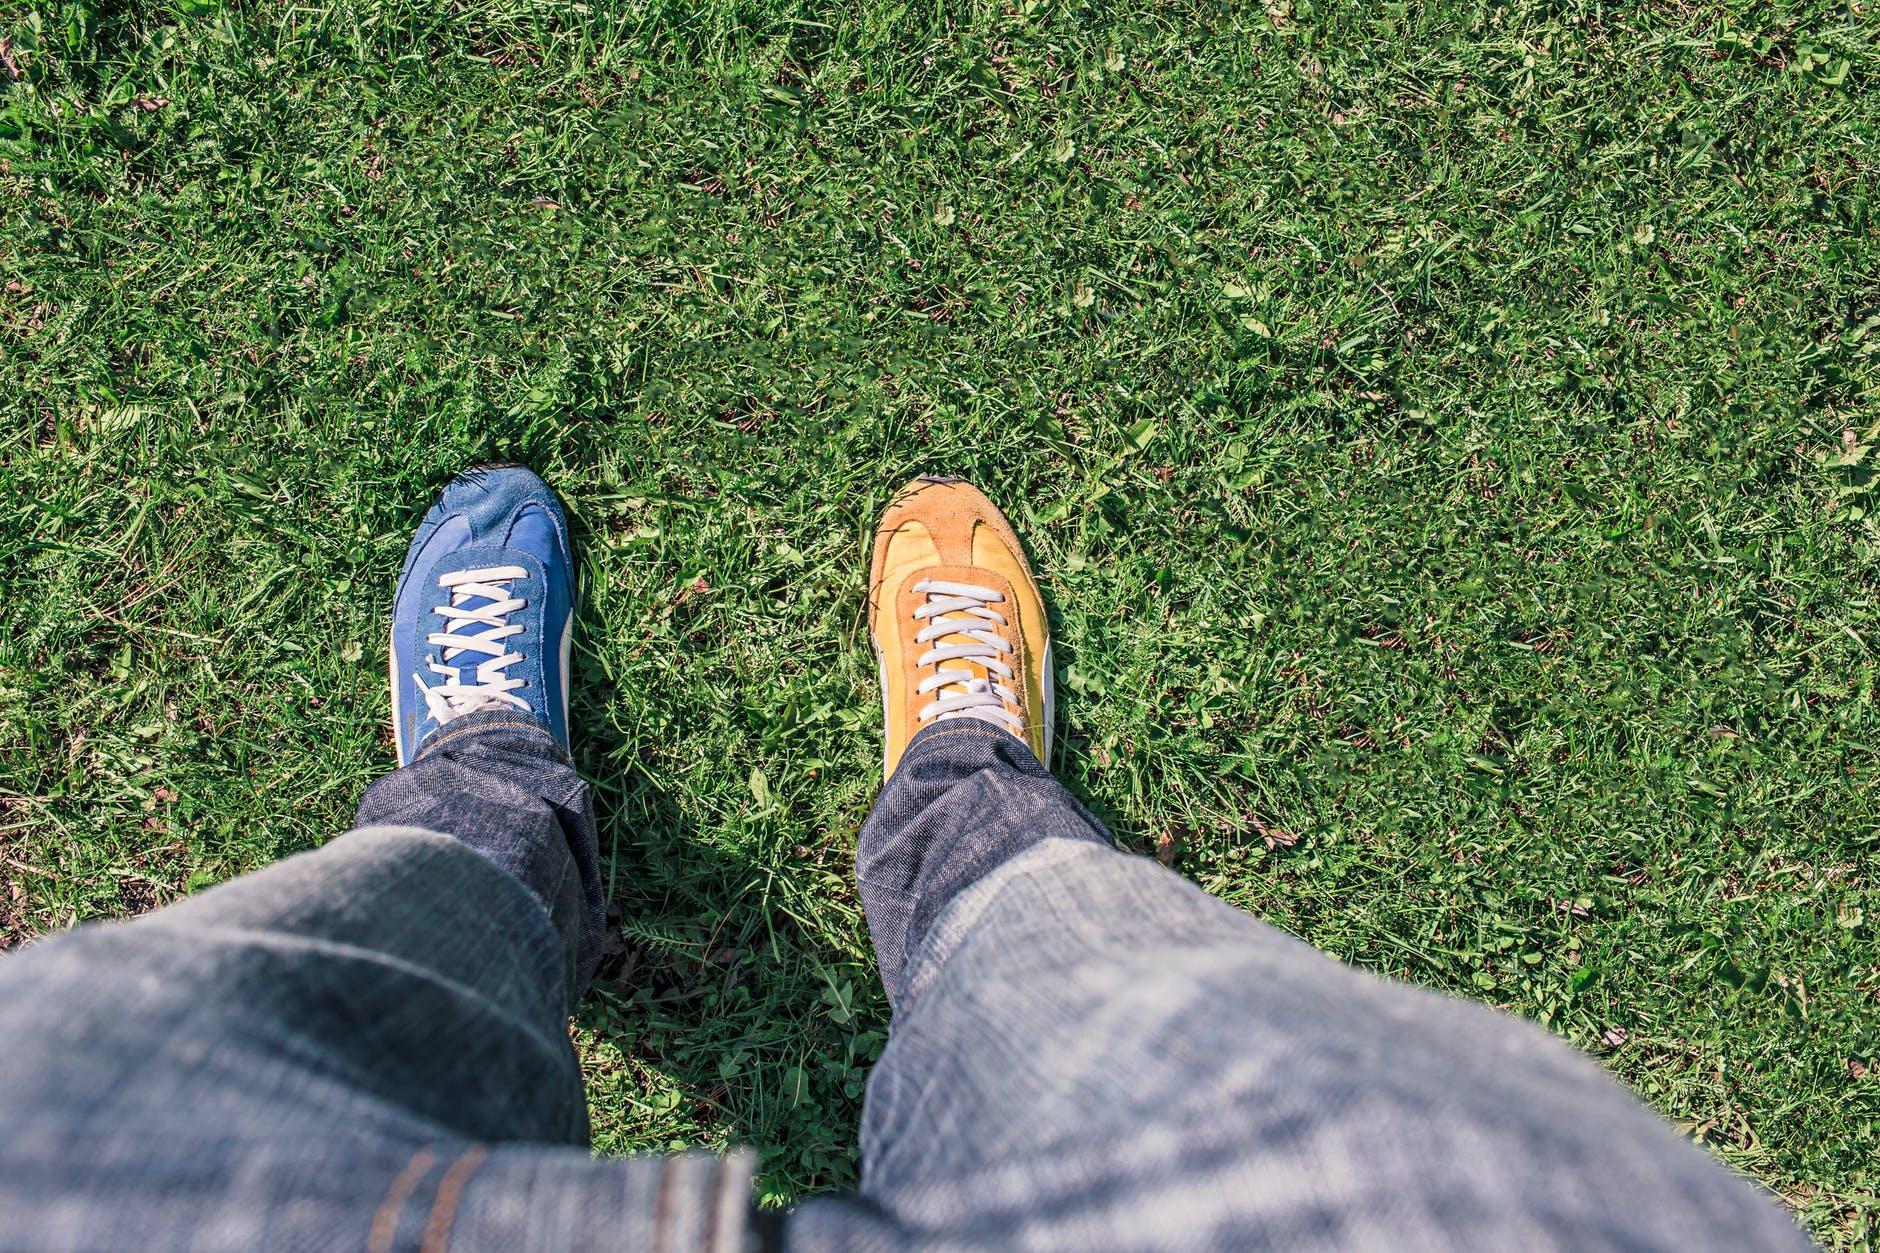 man person legs grass